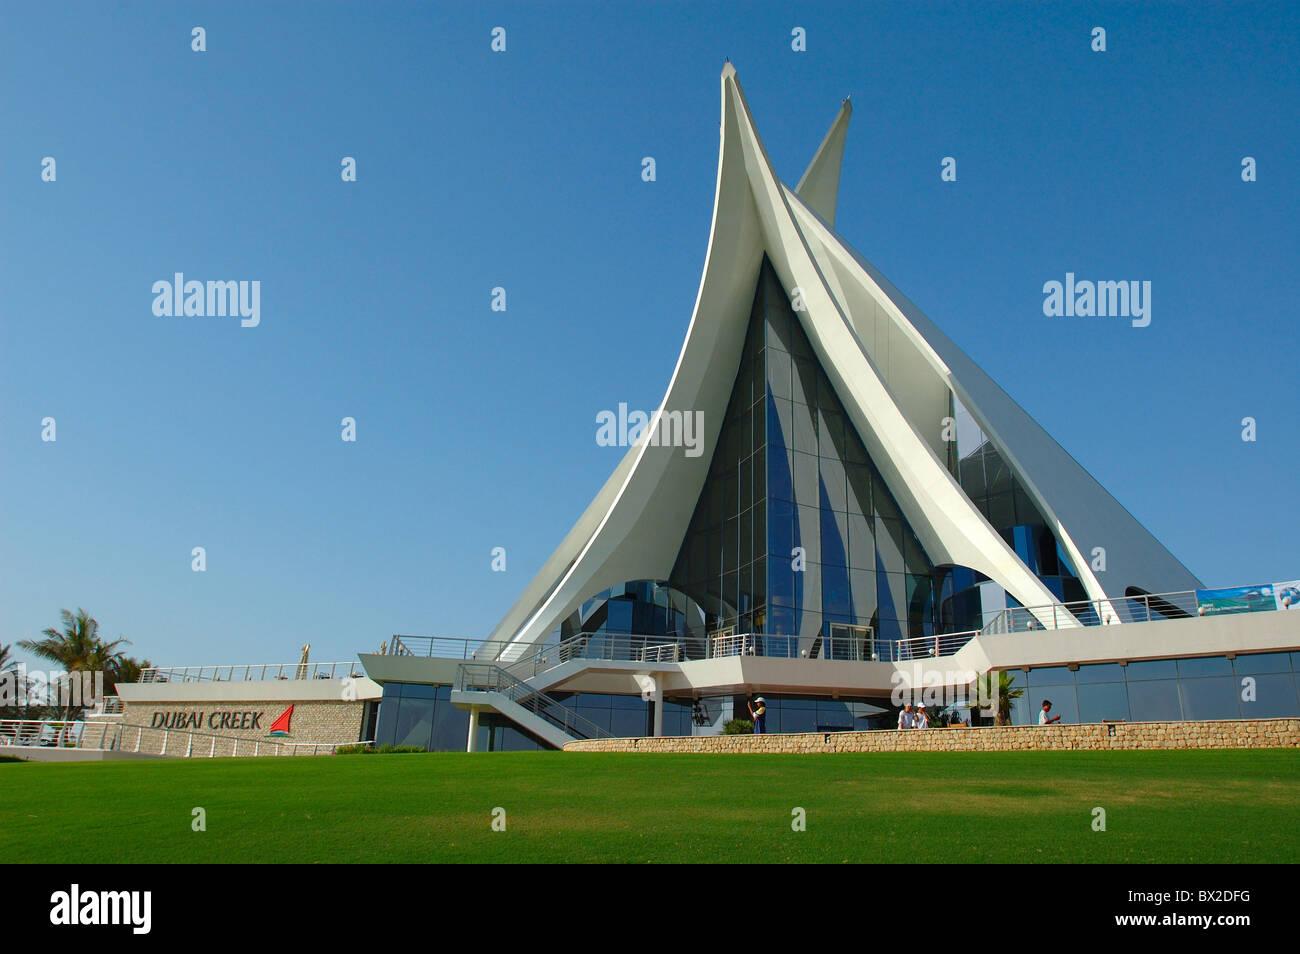 Golf golf course club house modern architecture dubai for Dubai architecture moderne